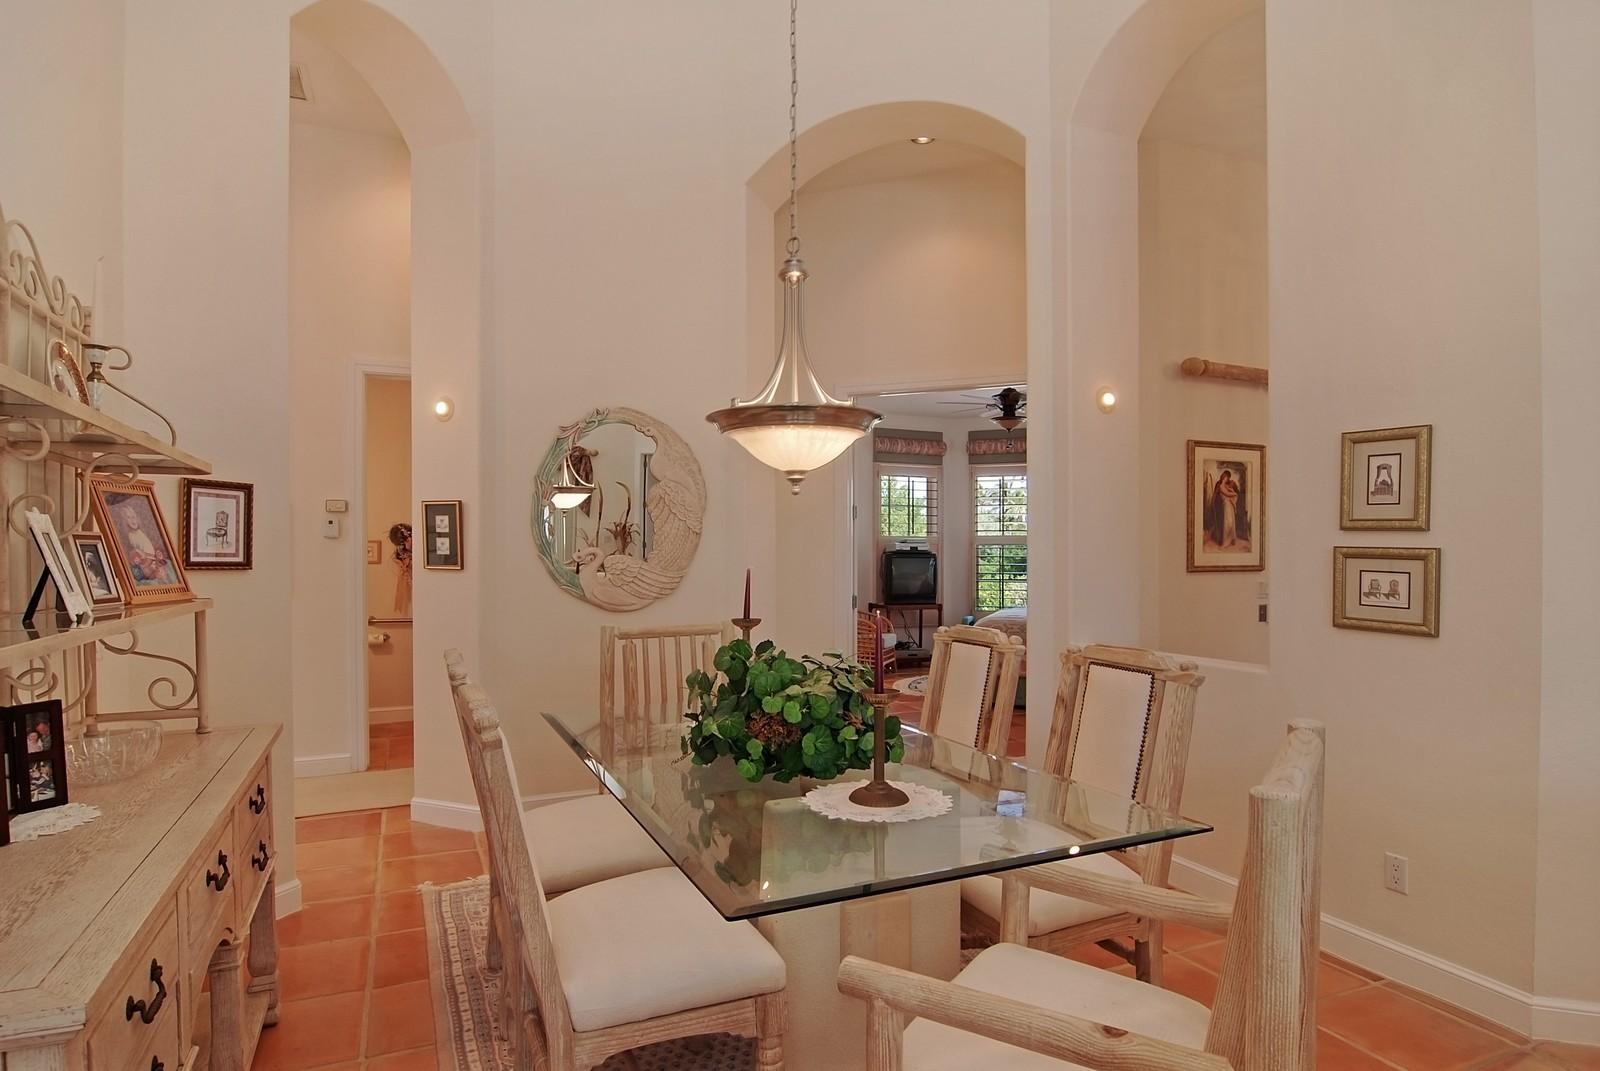 Real Estate Photography - 7000 SE Lakeview, Stuart, FL, 34996 - Dining Room